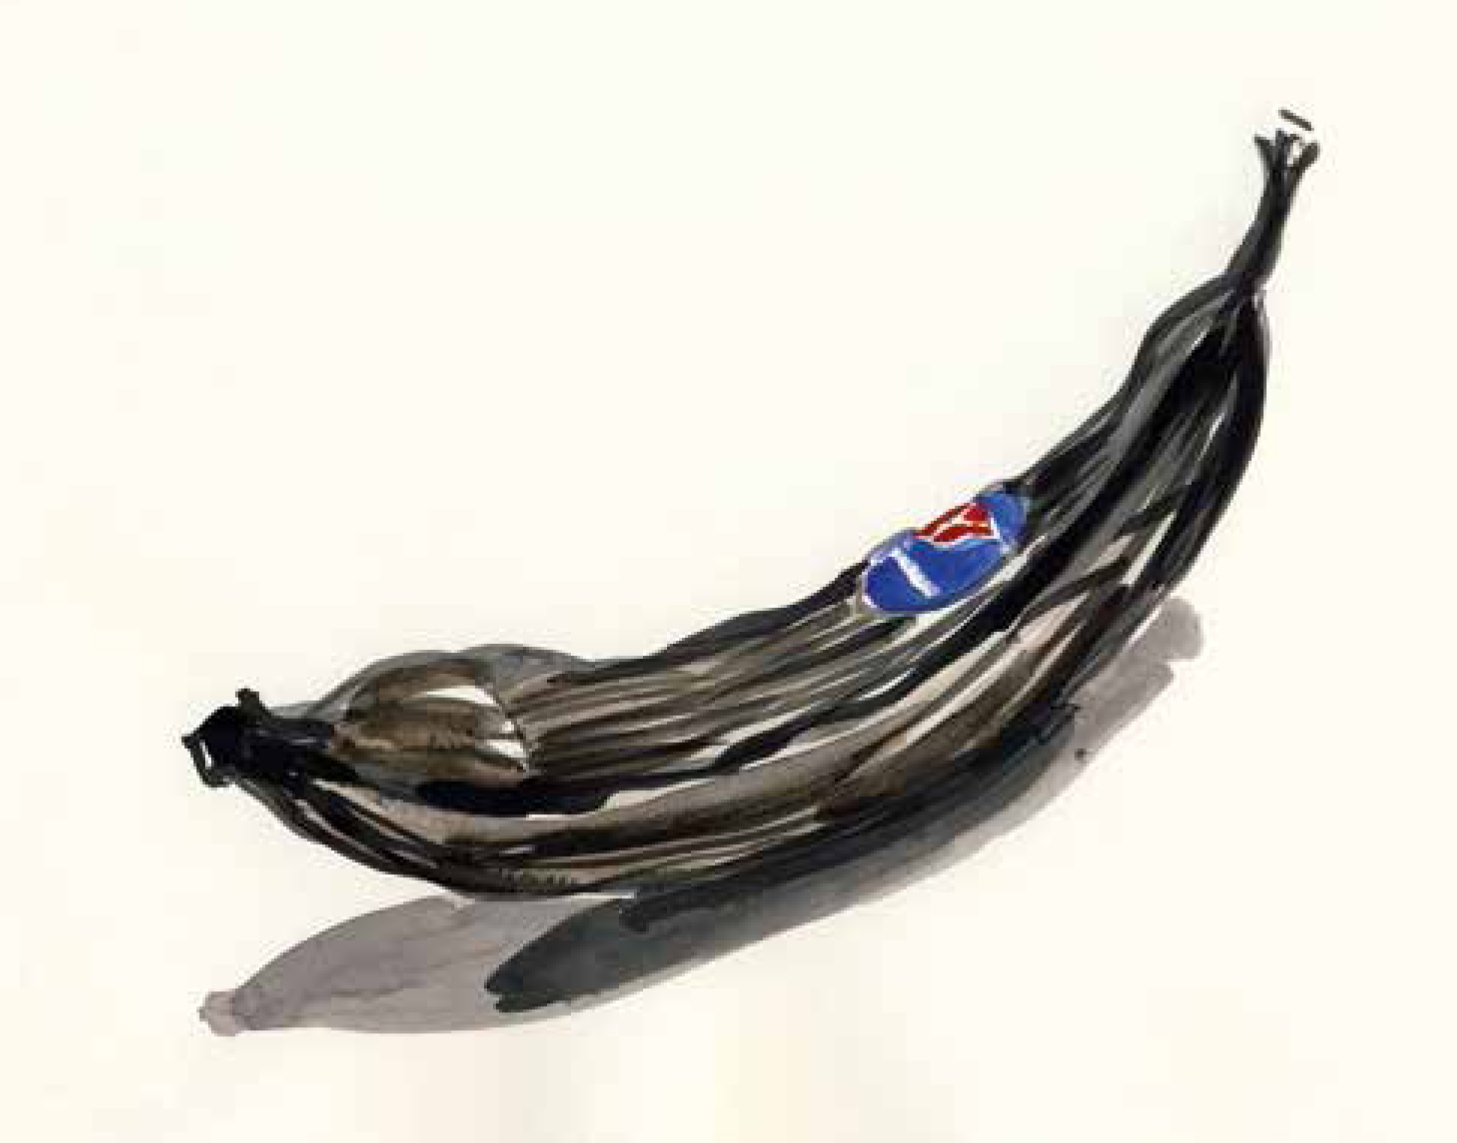 Sehr reife Banane, Aquarell auf Werkdruckpapier, A4